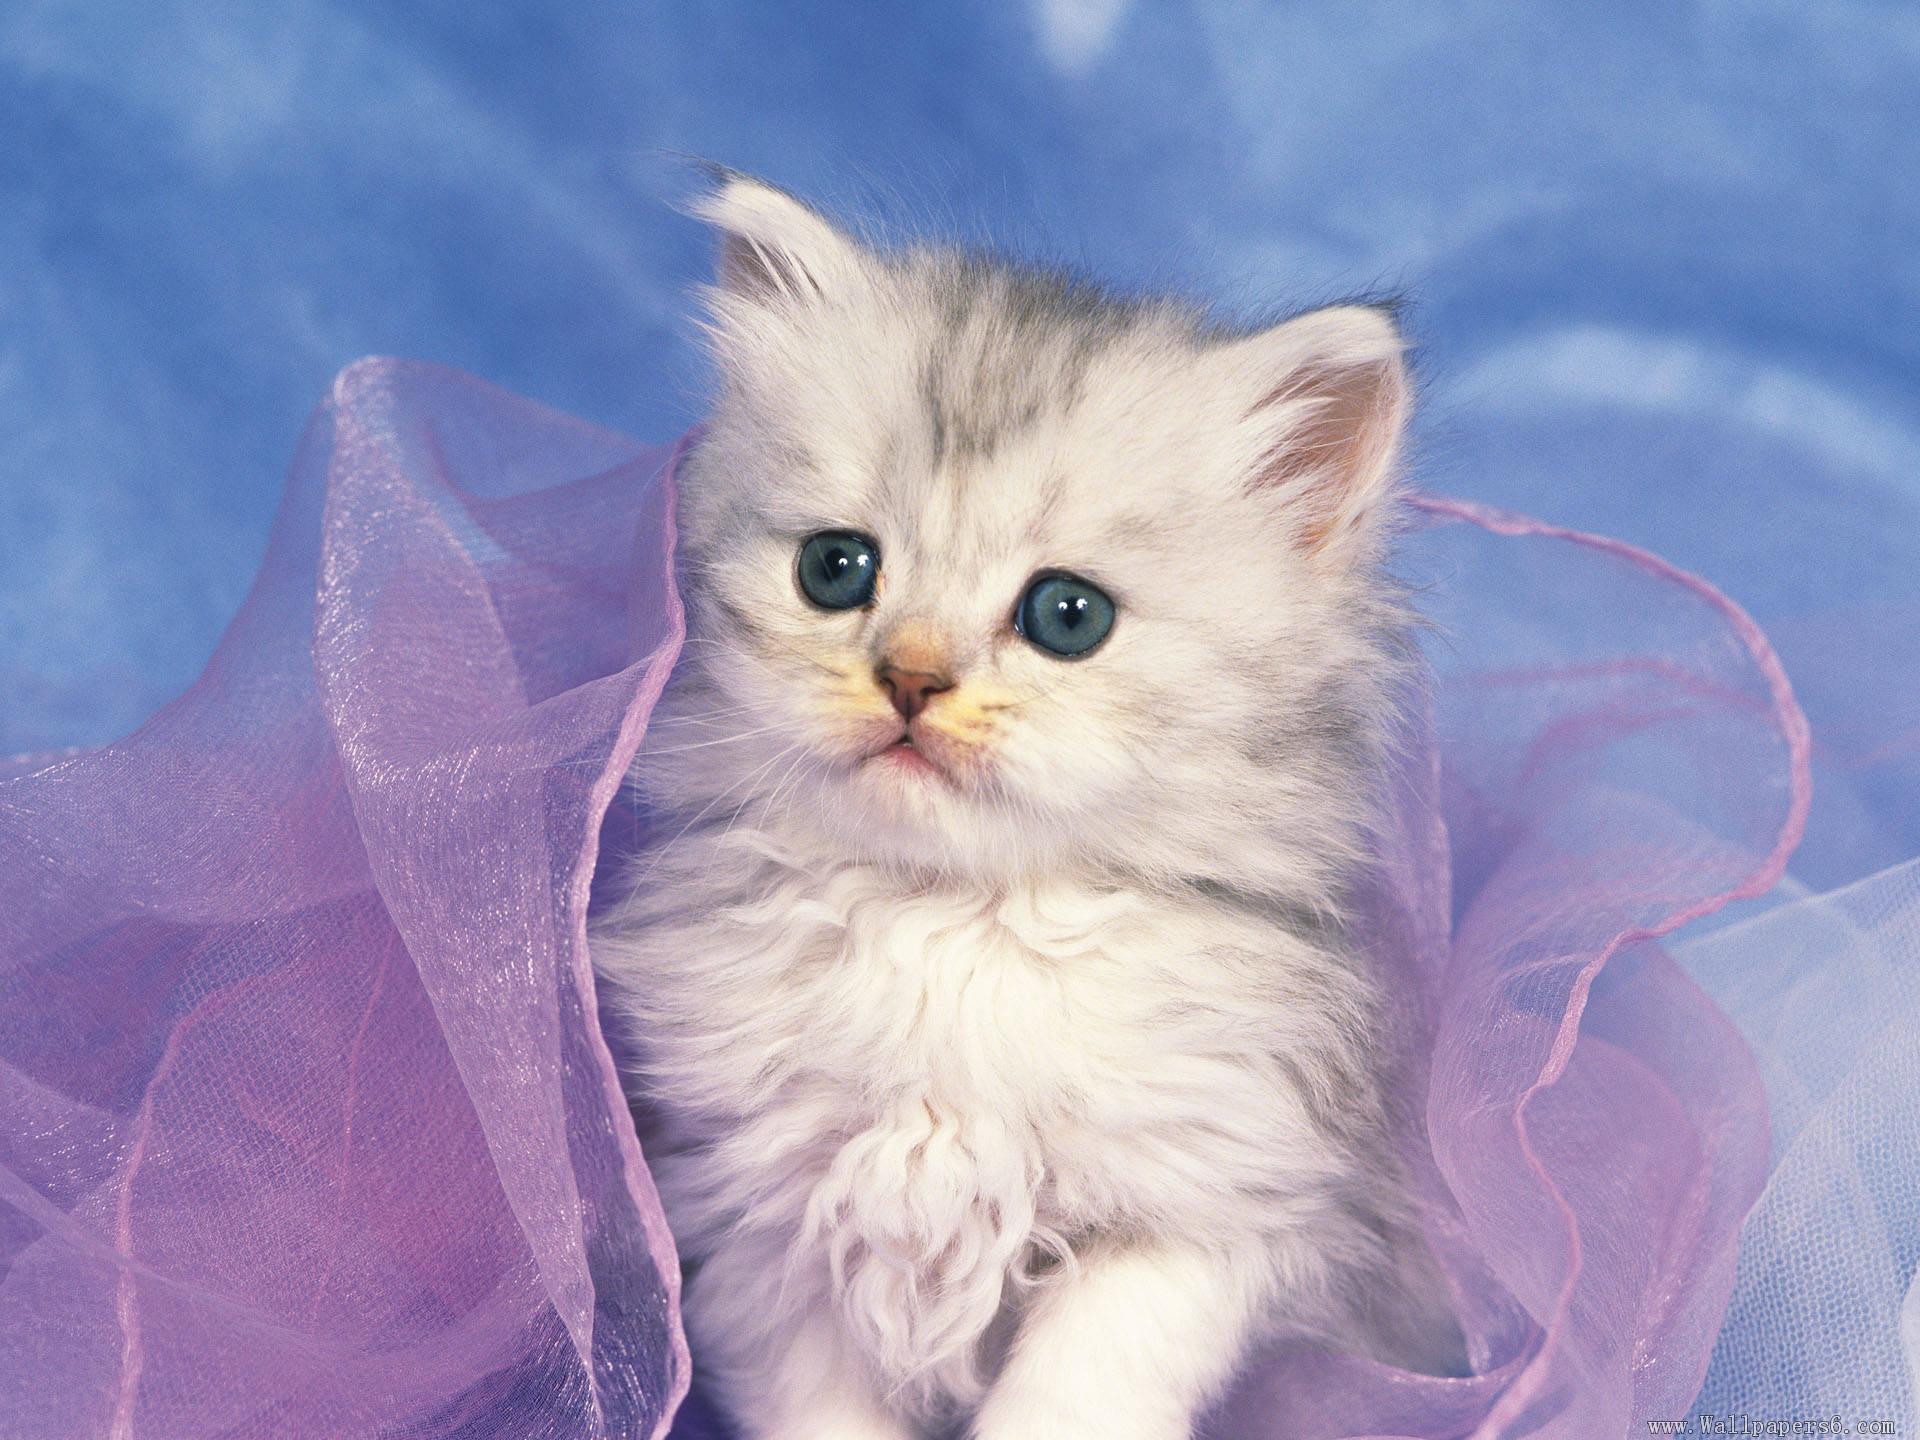 Cute White Kittens Wallpaper | Wallpaper Download